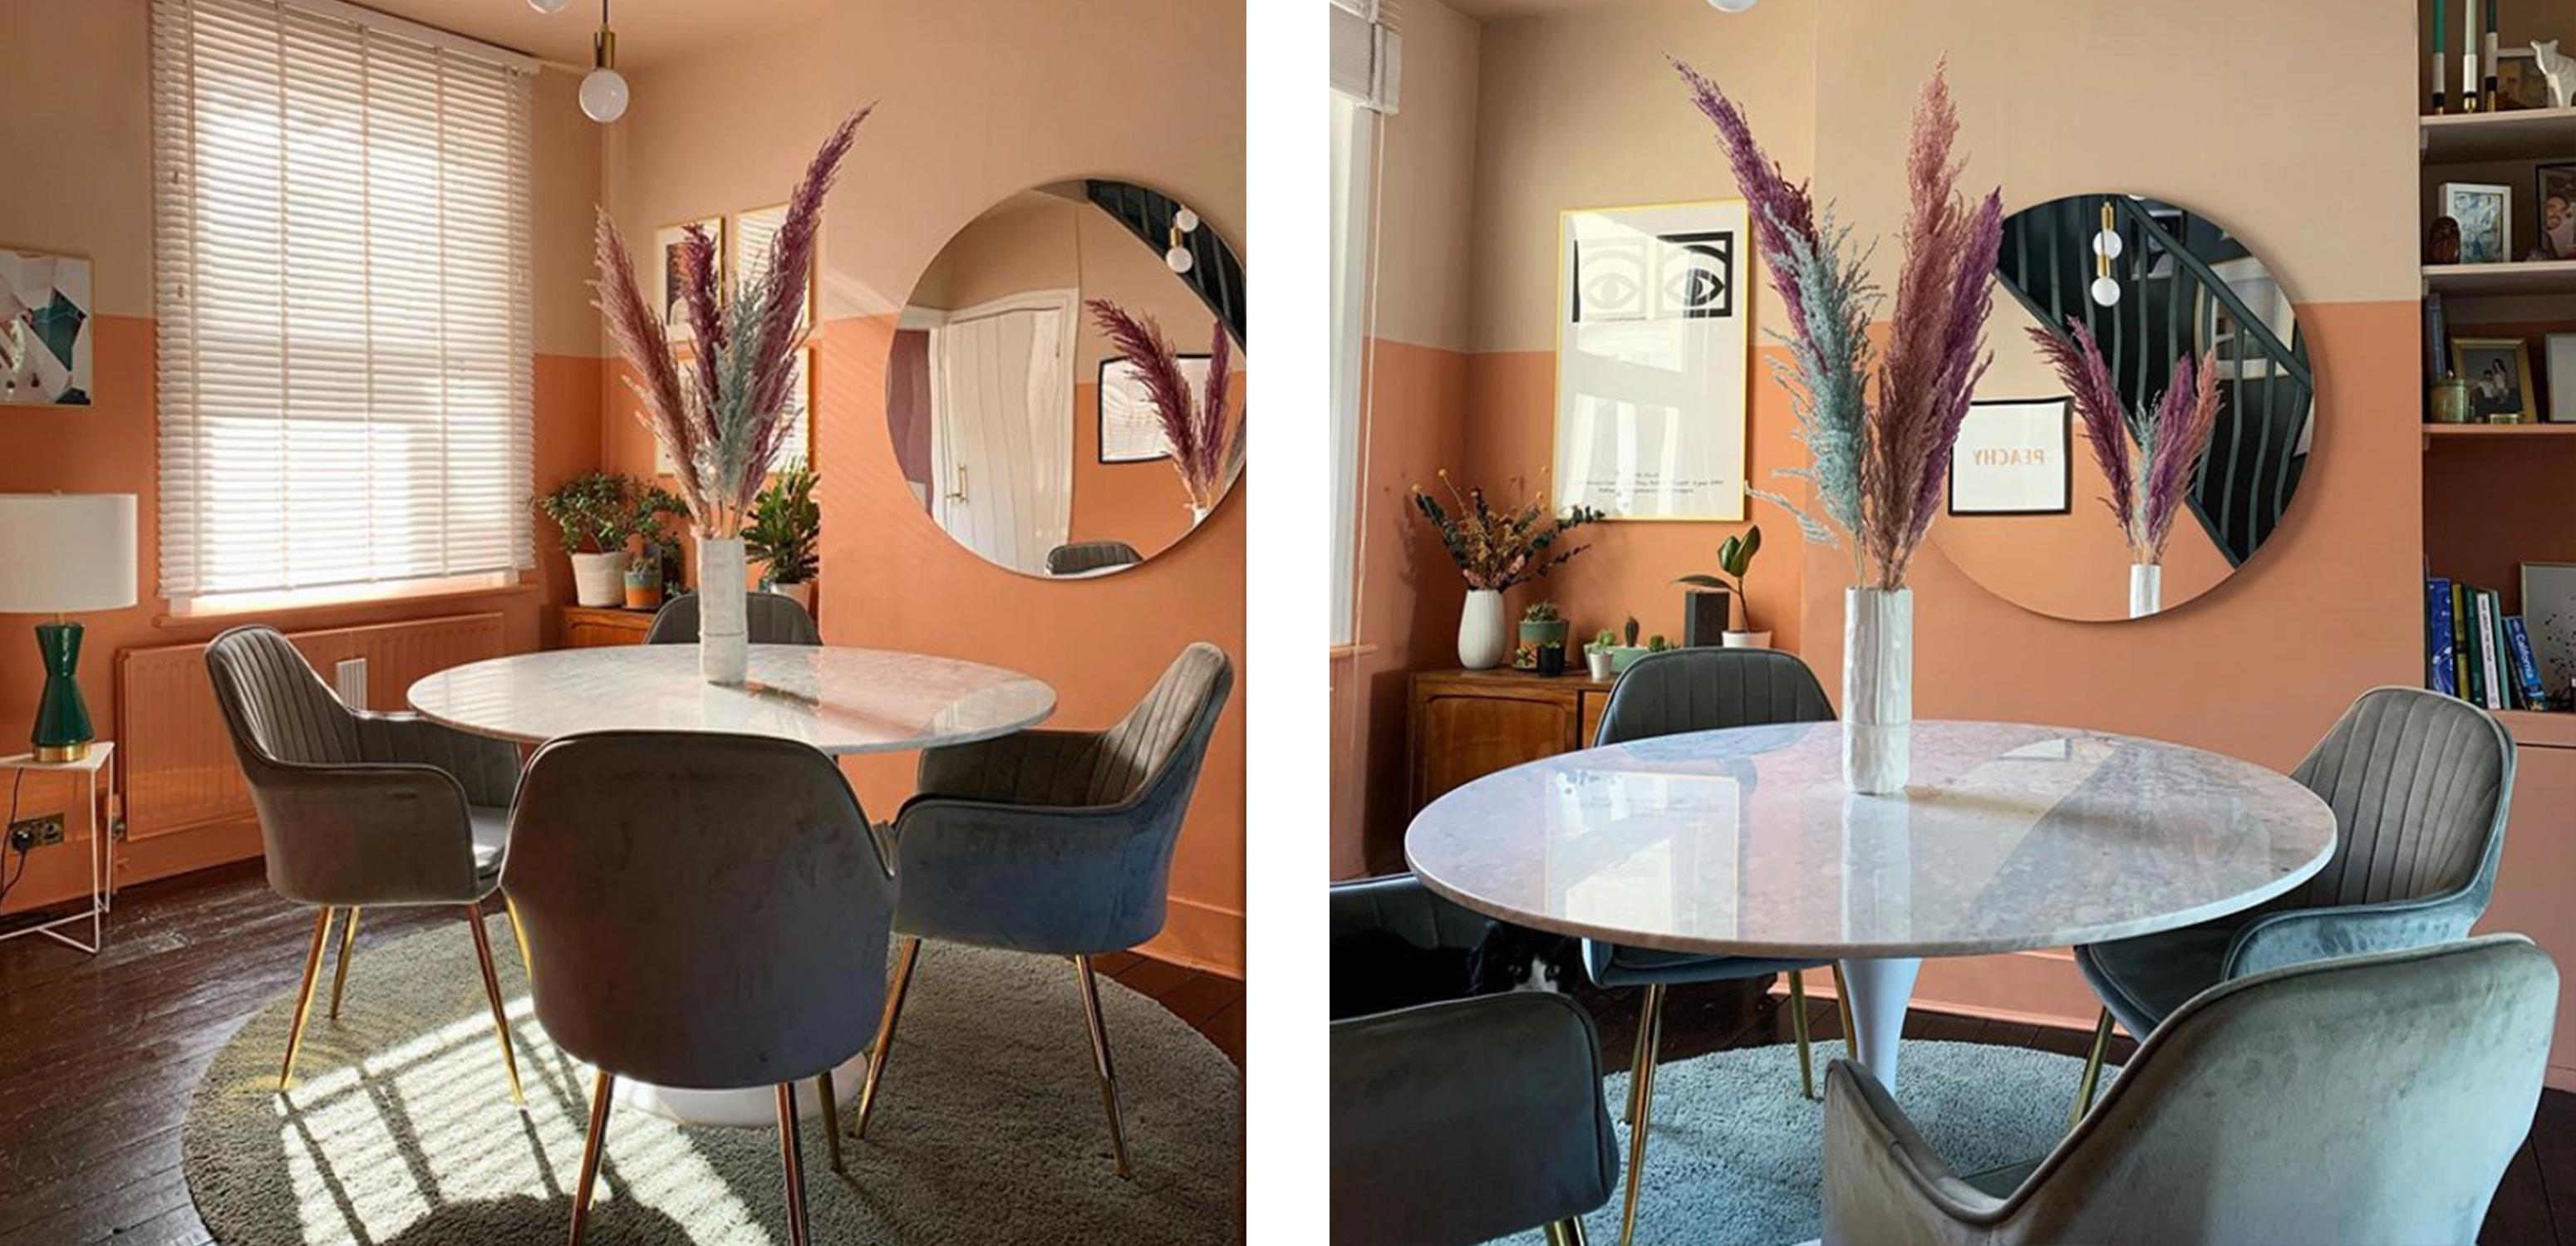 Dining Room Design Featuring Tulip Tables